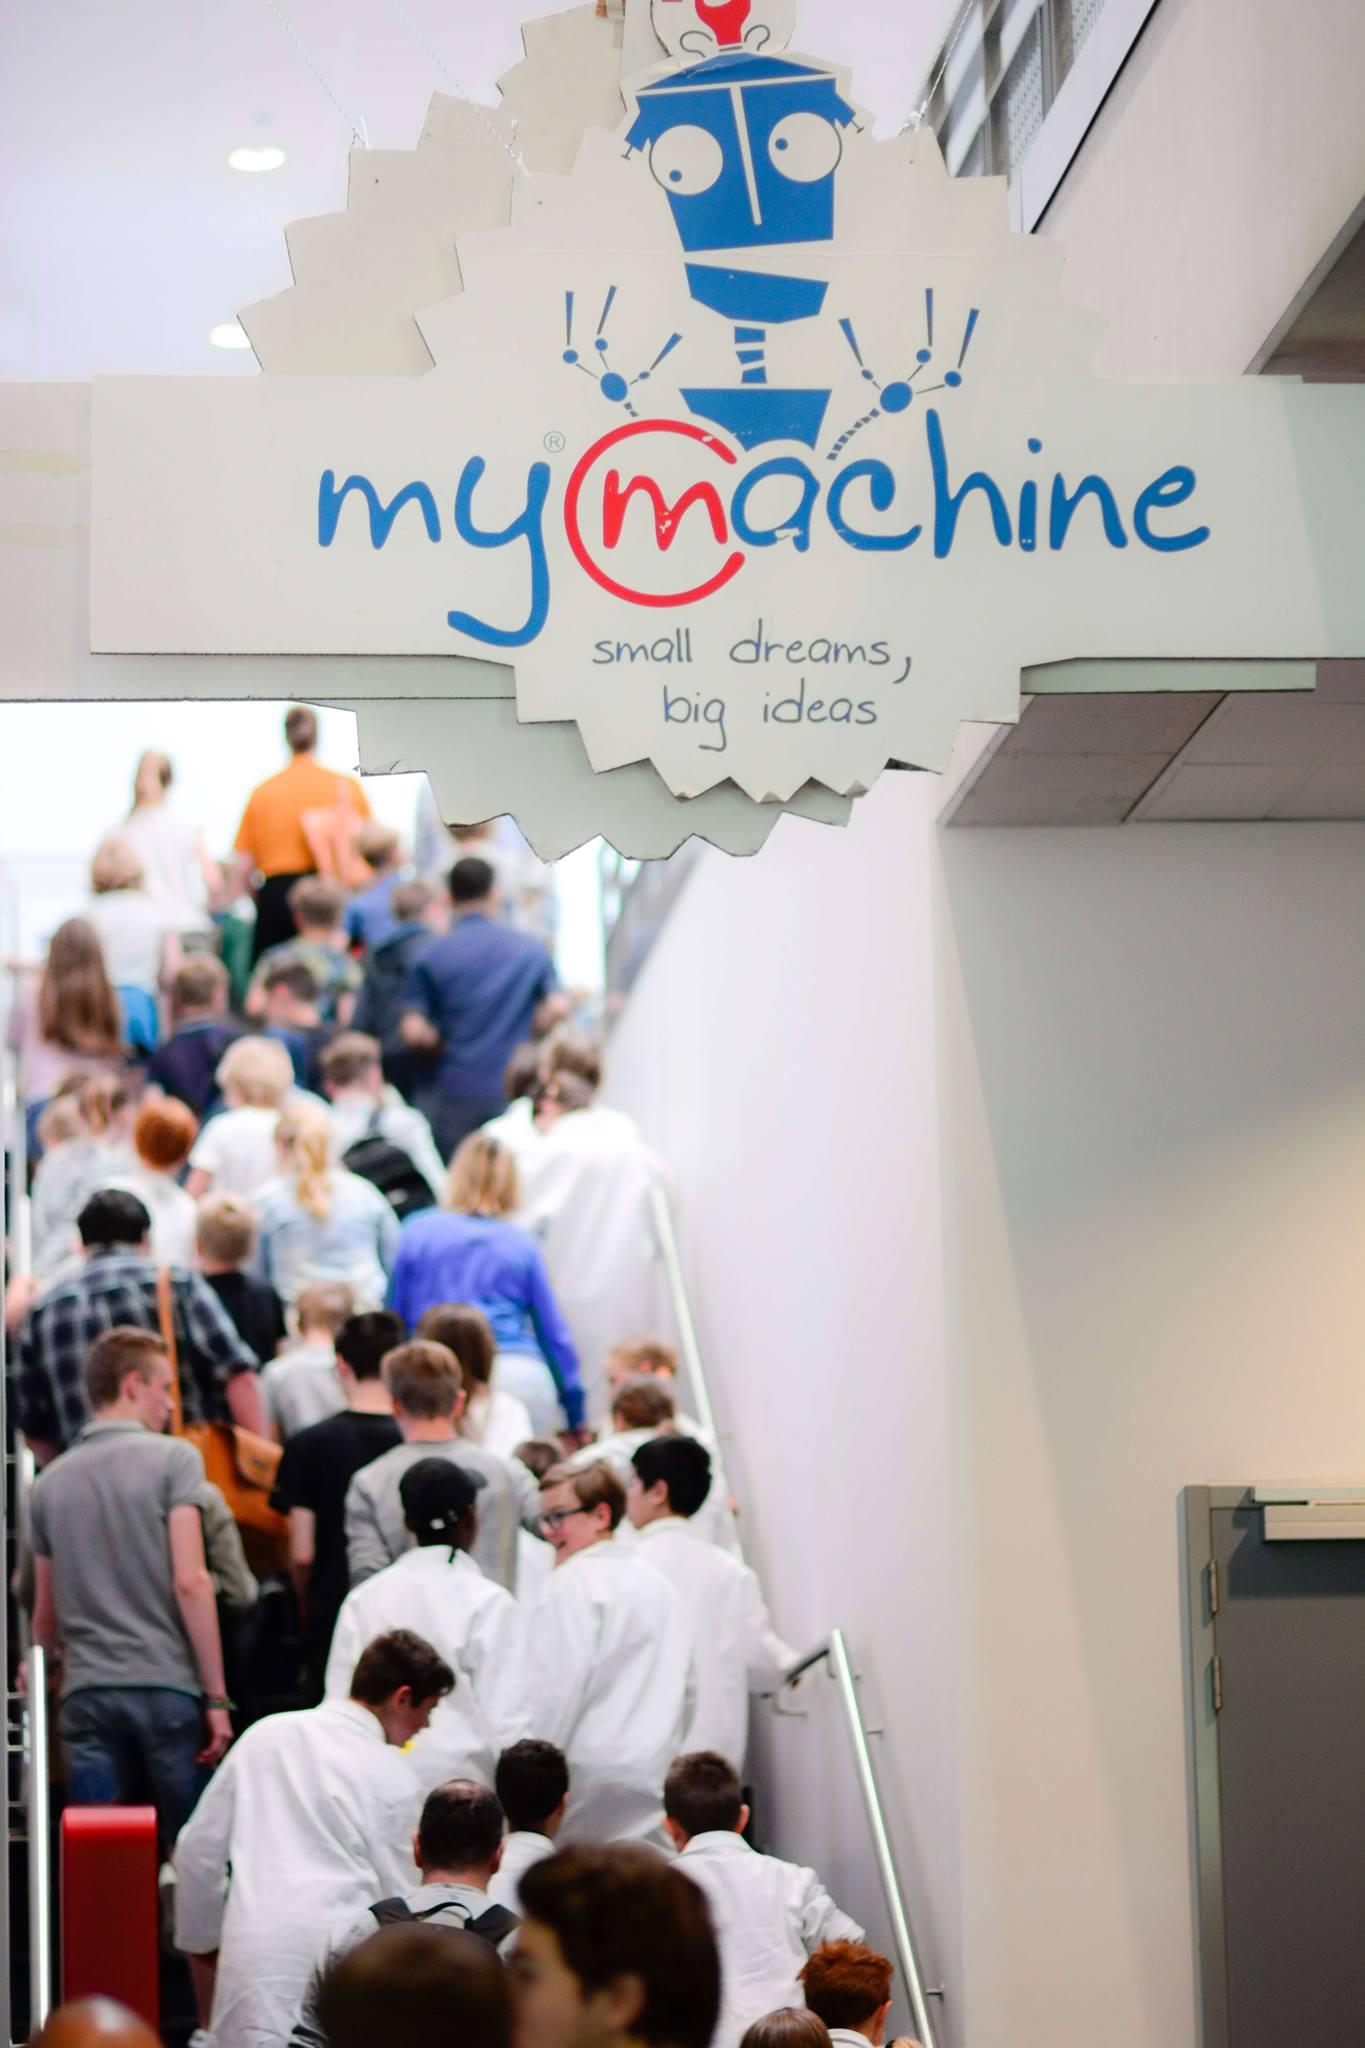 MyMachine Belgium 2018 Exhibition35114802_952442848268111_1273474845694230528_o